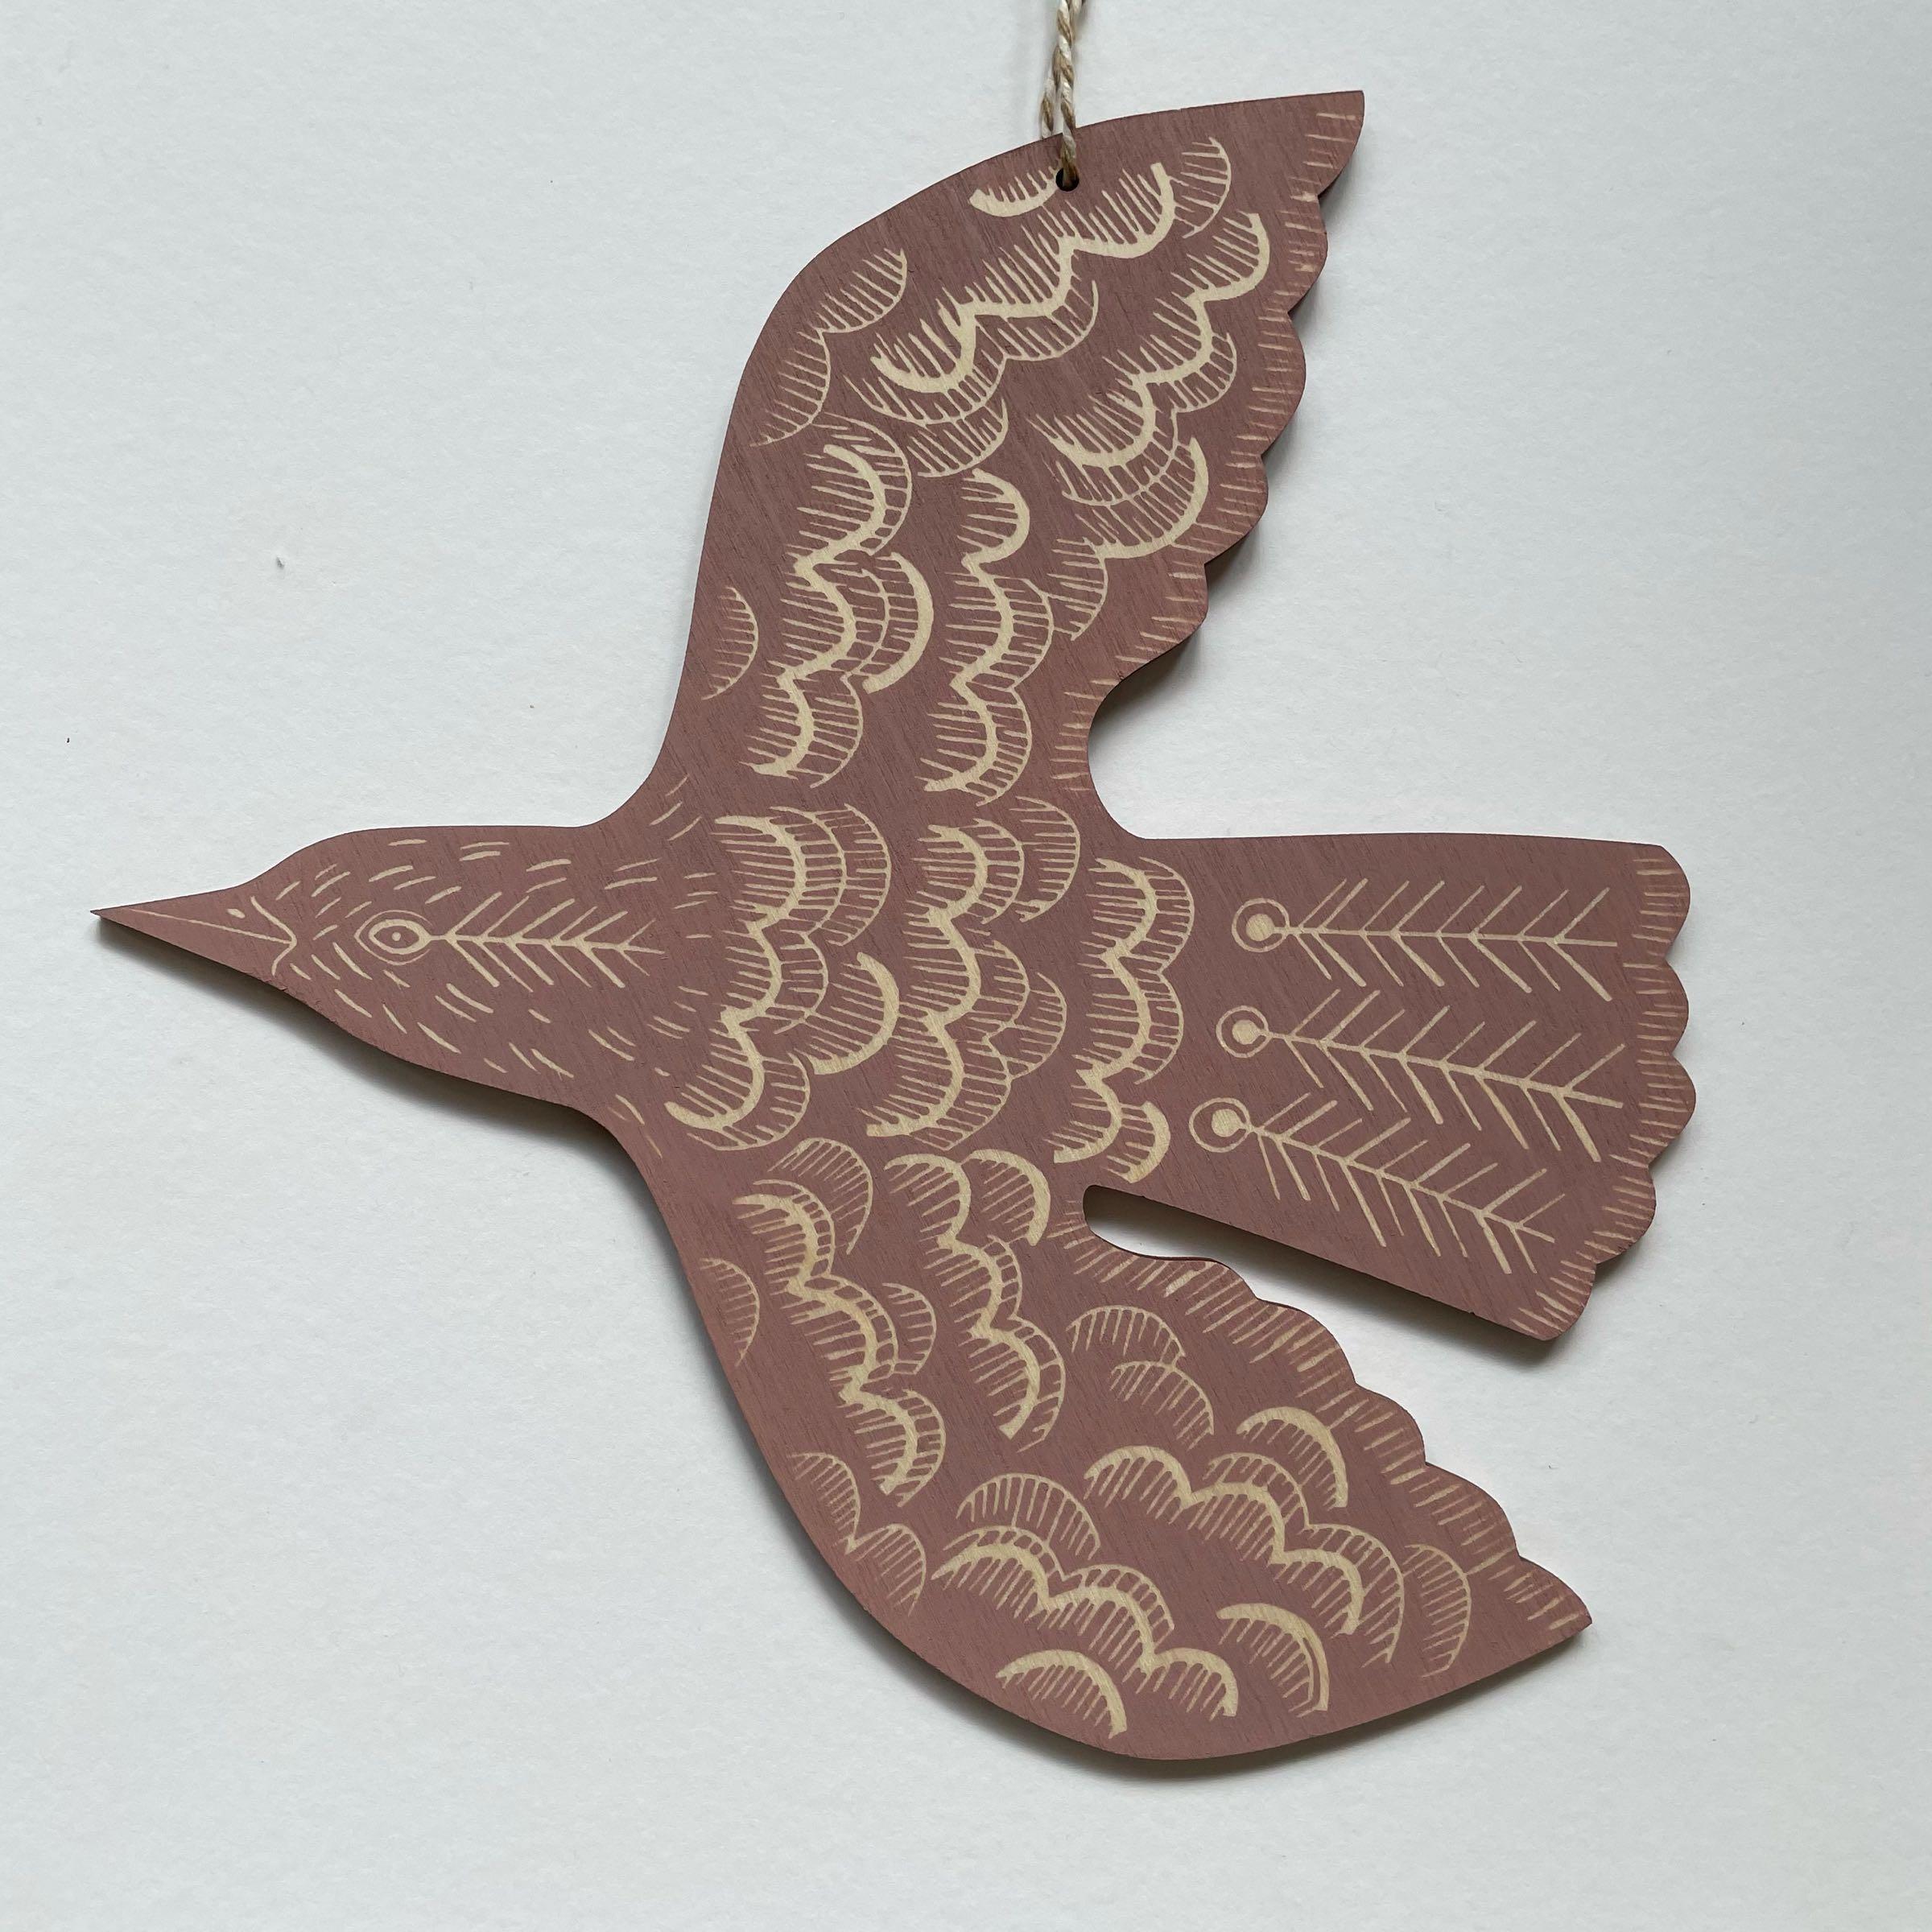 Hanging Blackbird by Kate Millbank, dusky pink